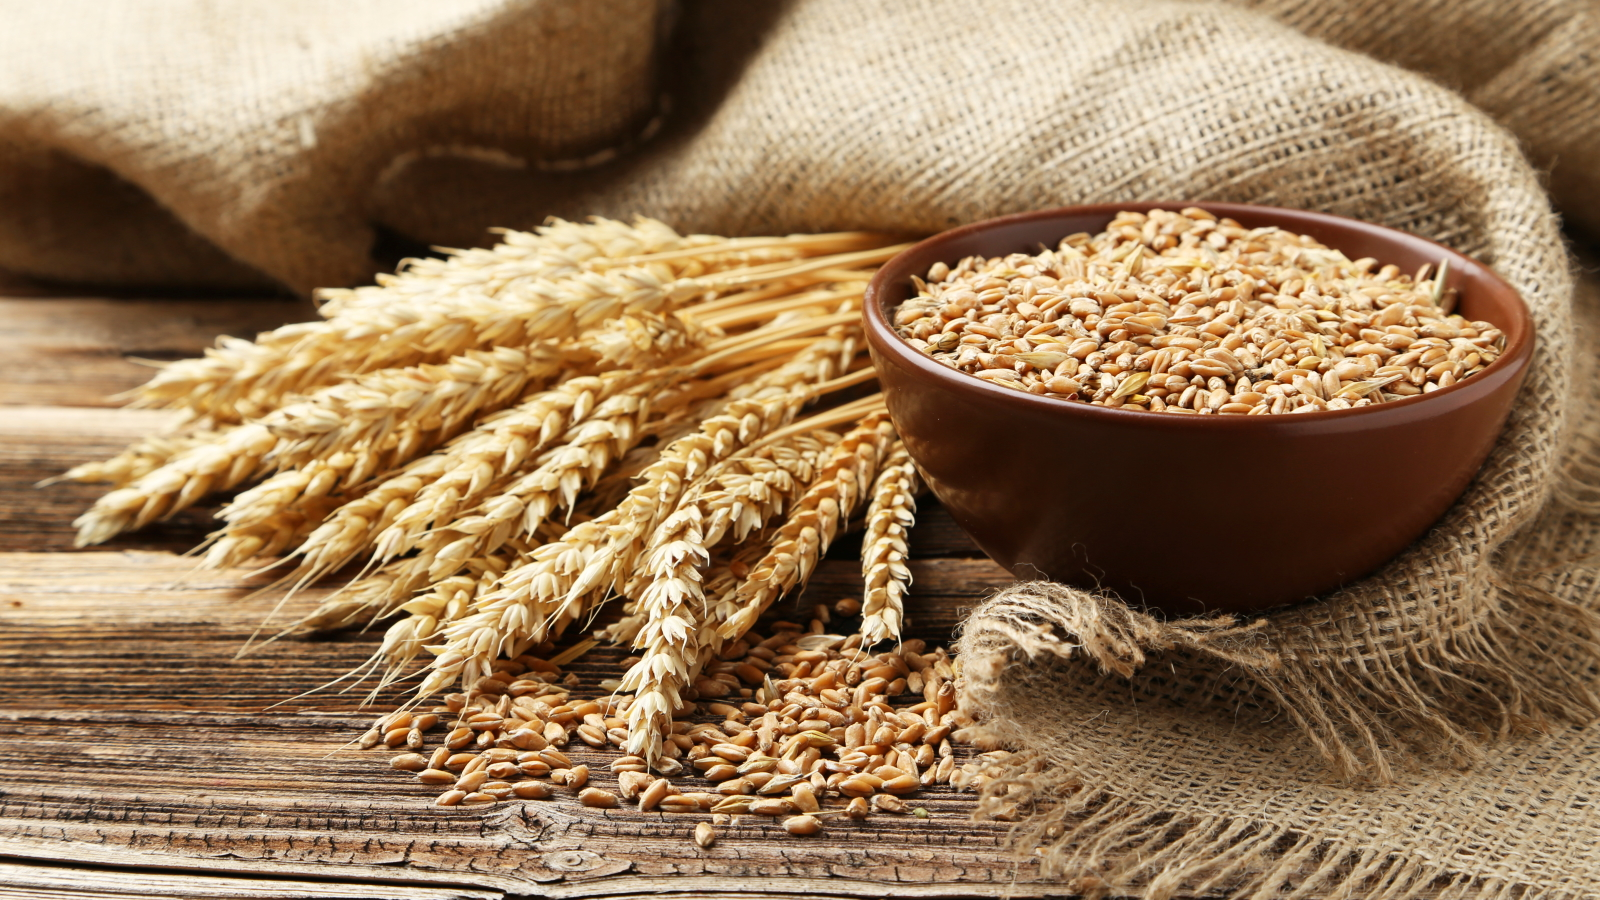 Alergije na pšenico ne gre zamenjevati s celiakijo